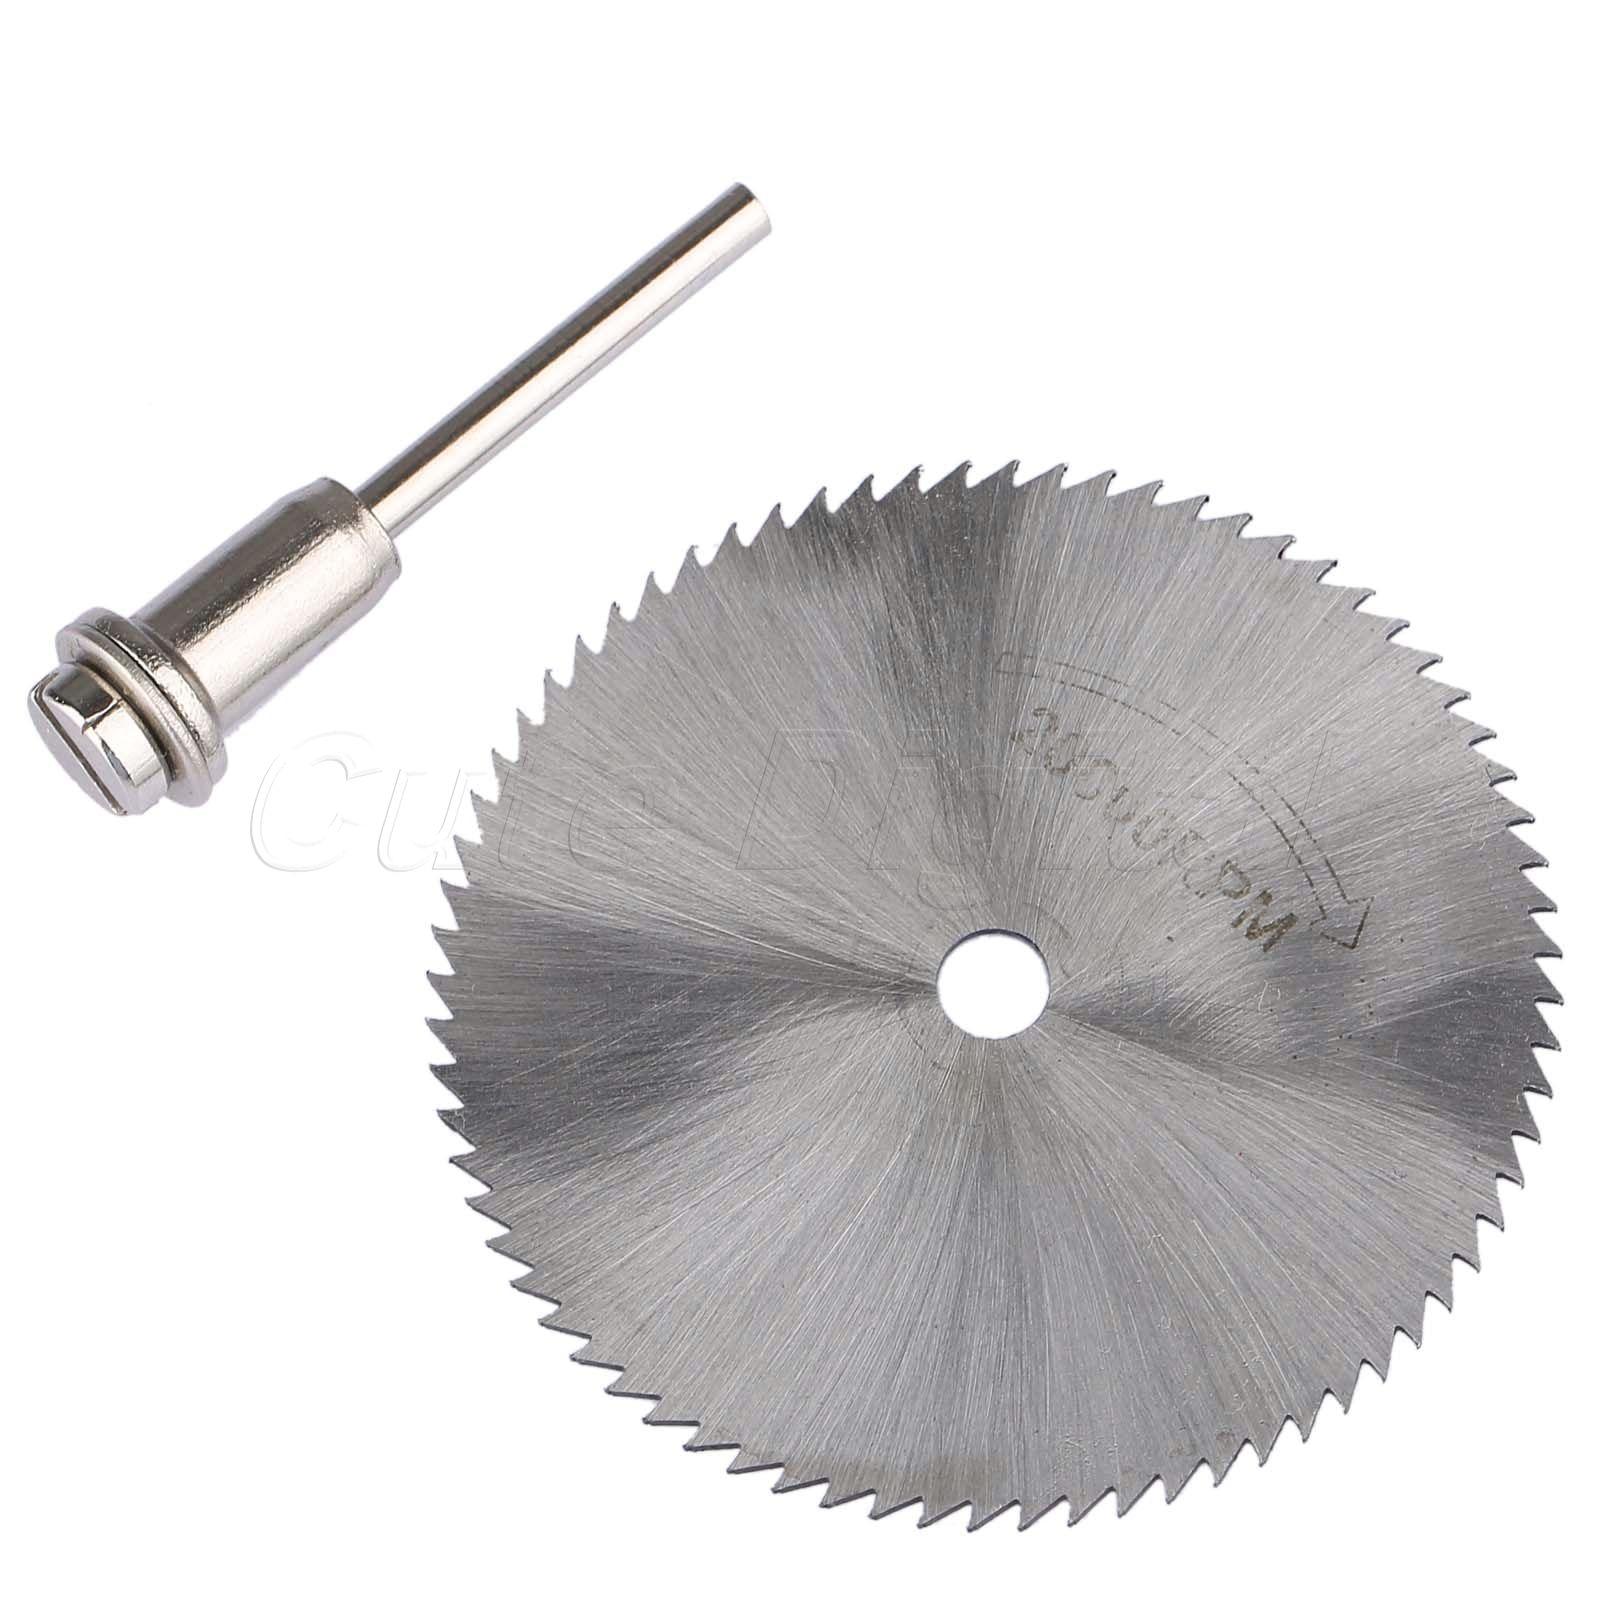 60mm Diamond Cutting Disc Mandrel Mini Circular Saw Blade Electric Saw For Drill Steel Rotary Cutting Tool Dremel Accessories